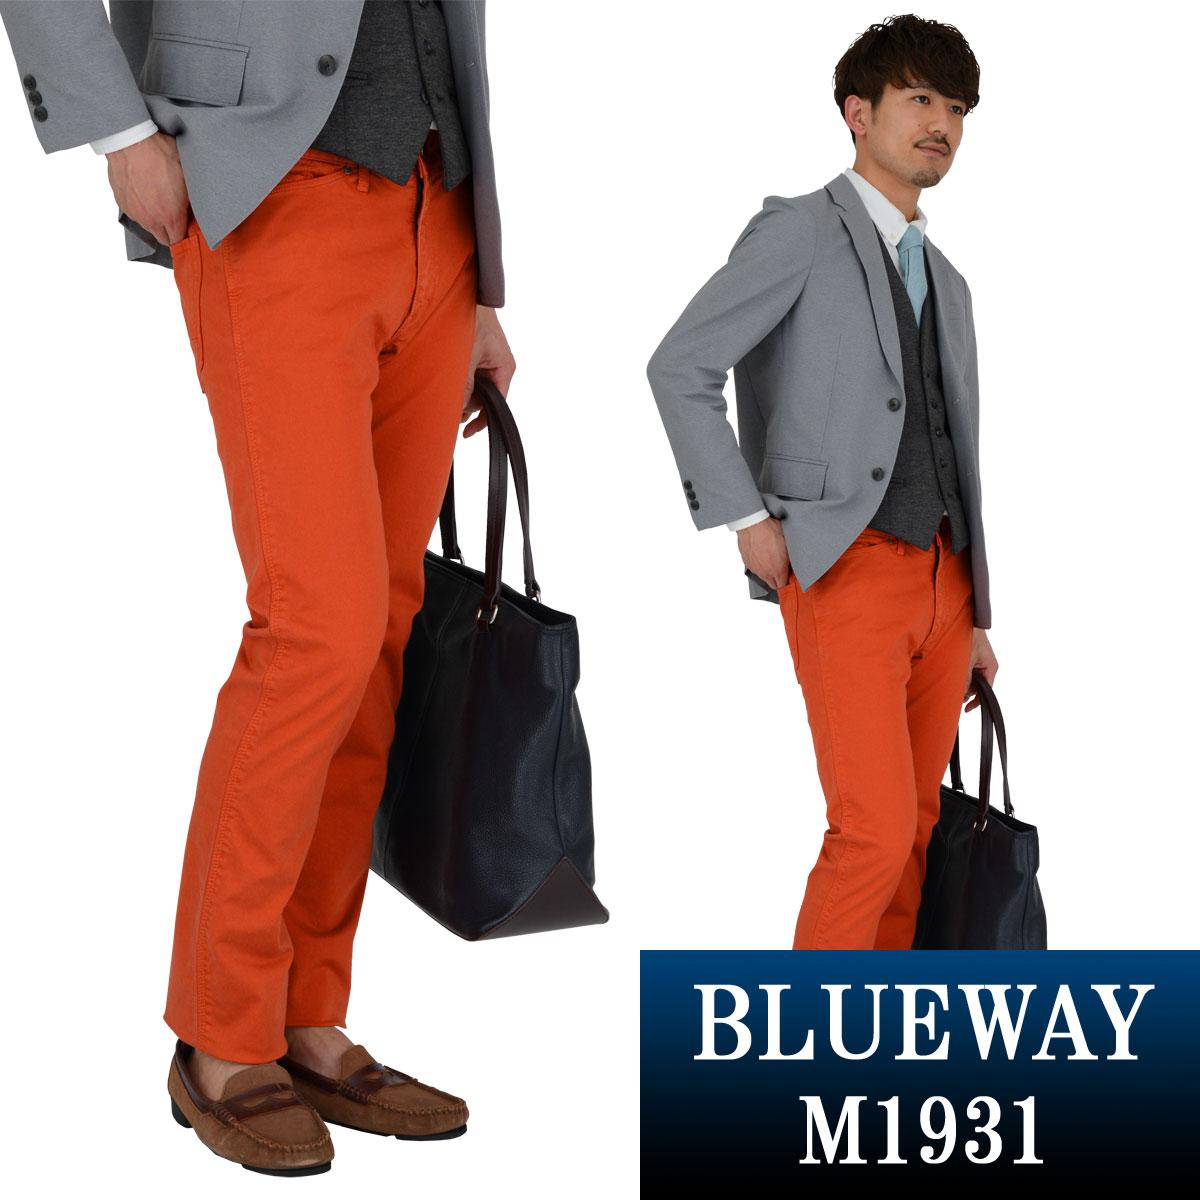 BLUEWAY:コーマストレッチサテン・タイトストレート パンツ(オレンジ):M1931-16 ブルーウェイ メンズ 裾上げ